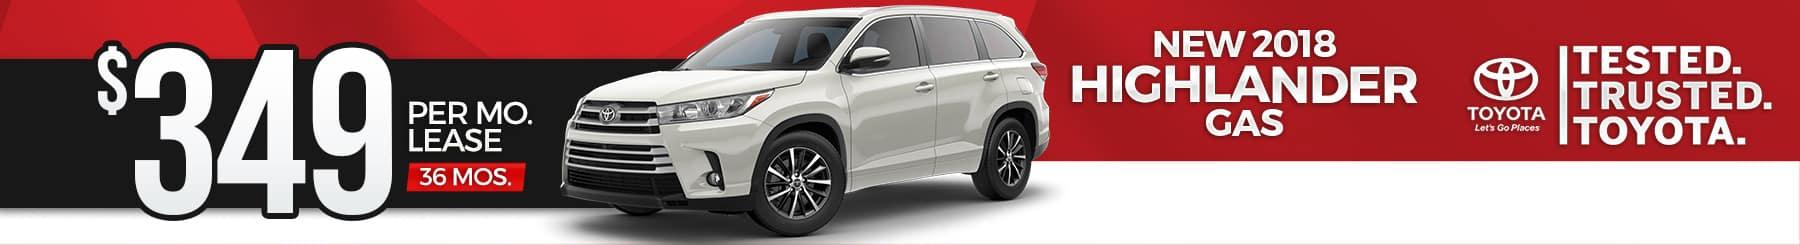 Toyota-Highlander-Lease-Special